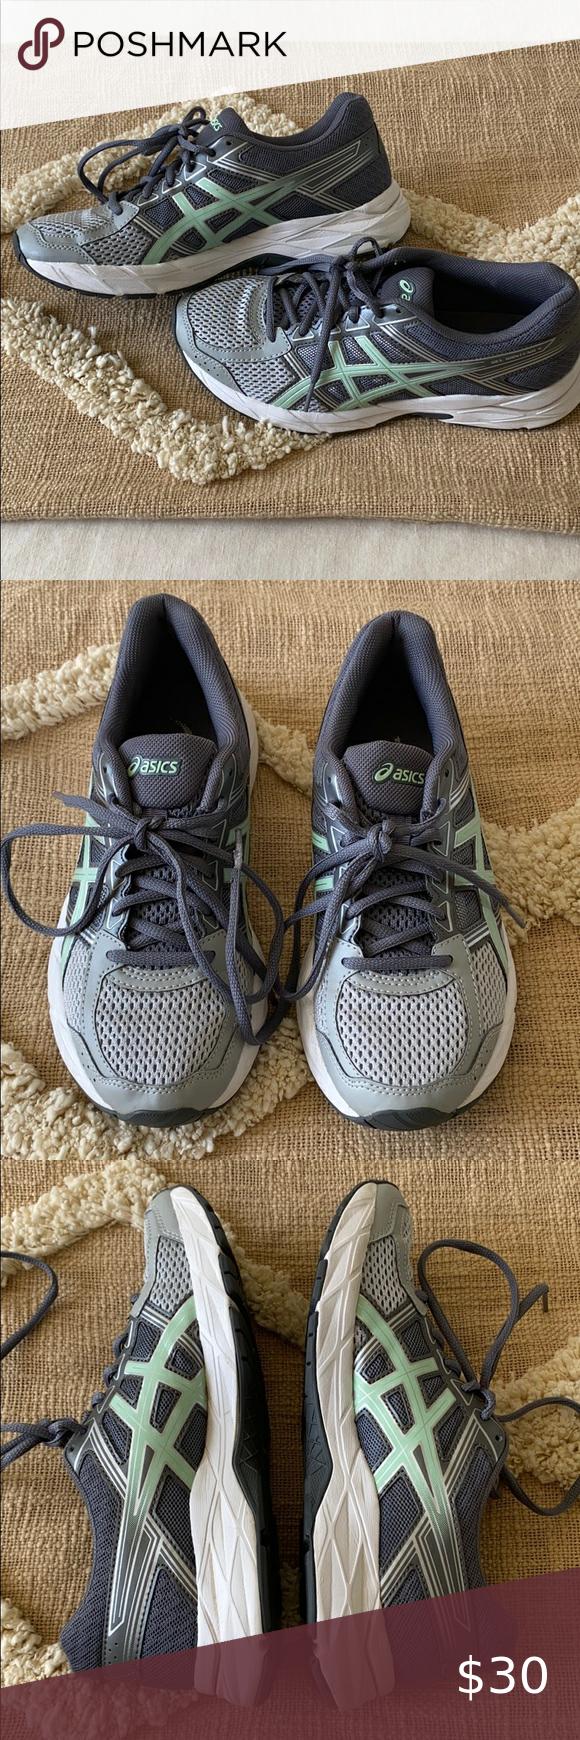 Asics Running Shoe Everyday comfort